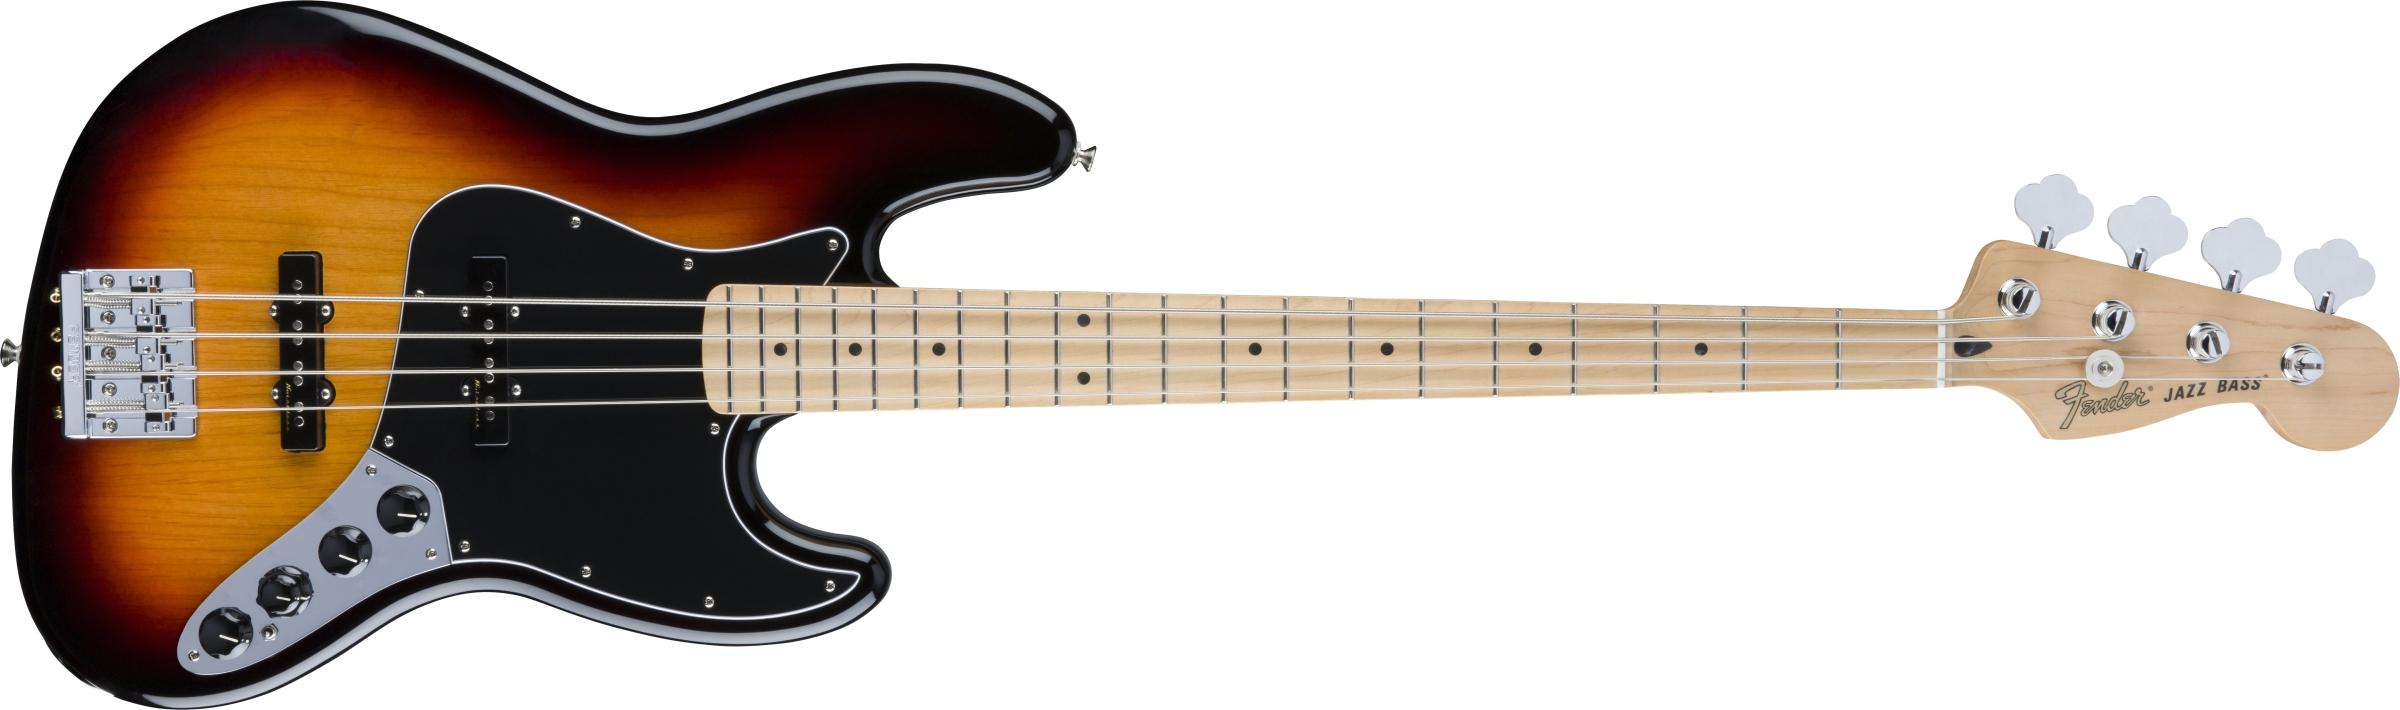 Circuito Ativo Fender Jazz Bass : Circuito jazz bass p wiring diagram google search